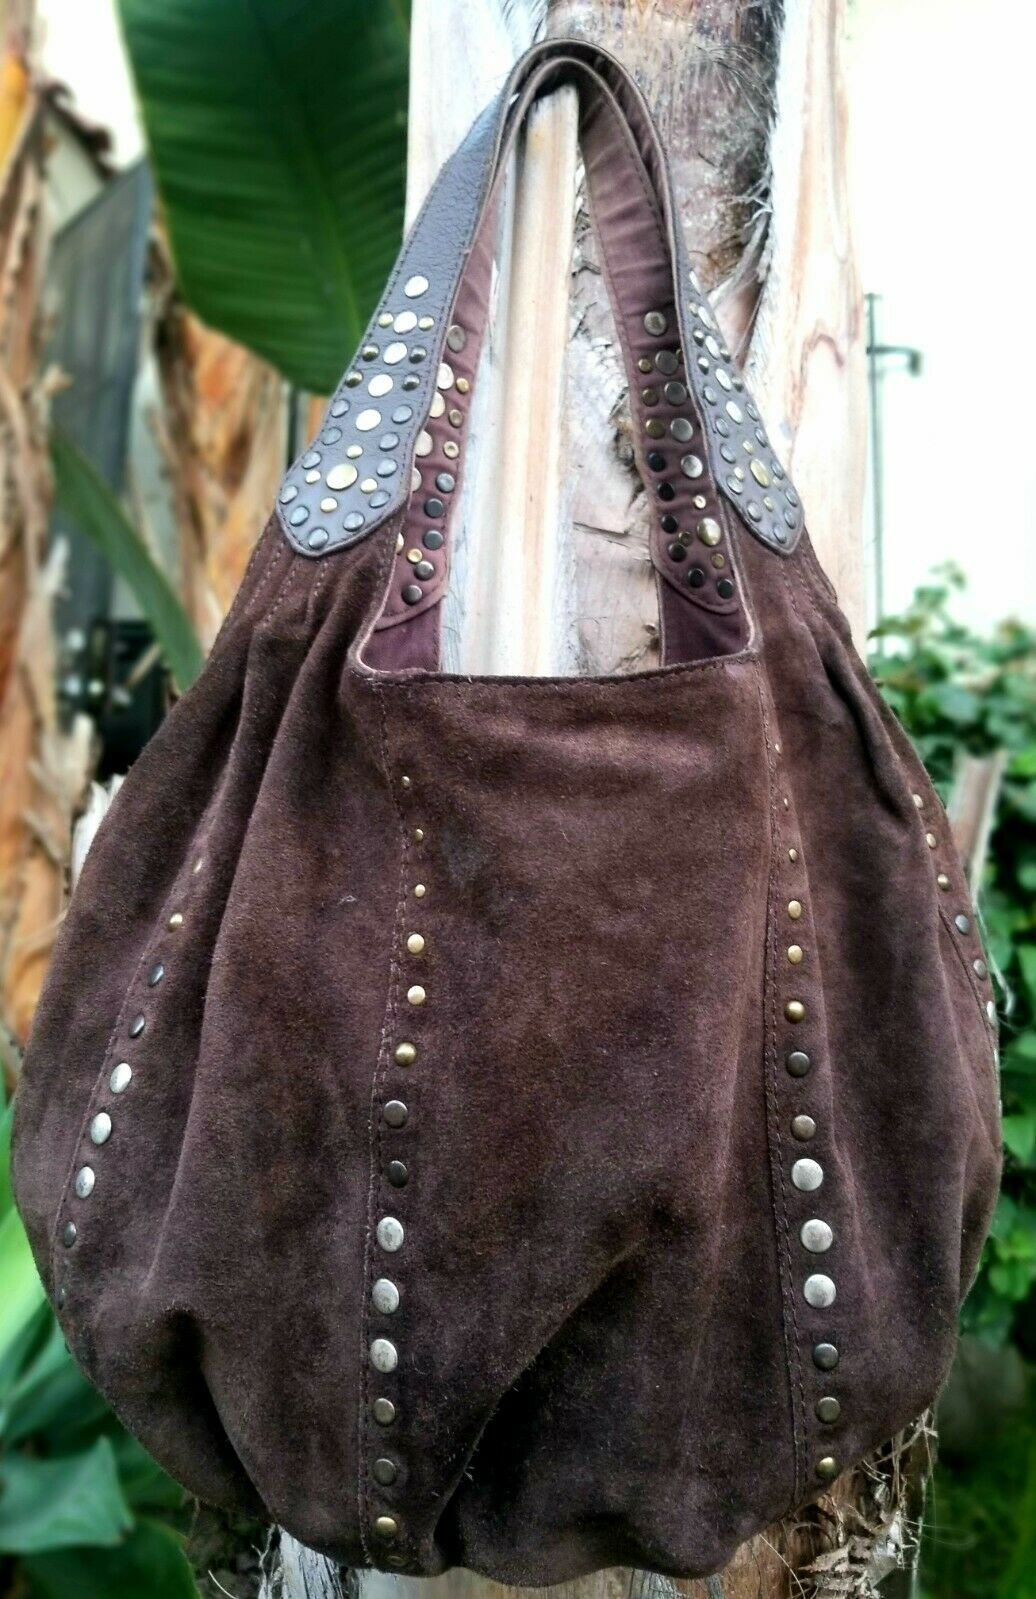 LUCKY BRAND Large Brown Leather Rounded Hobo Shoulder Carryall Studded Hobo Bag - C'mon » TikTokJa Video Downloader